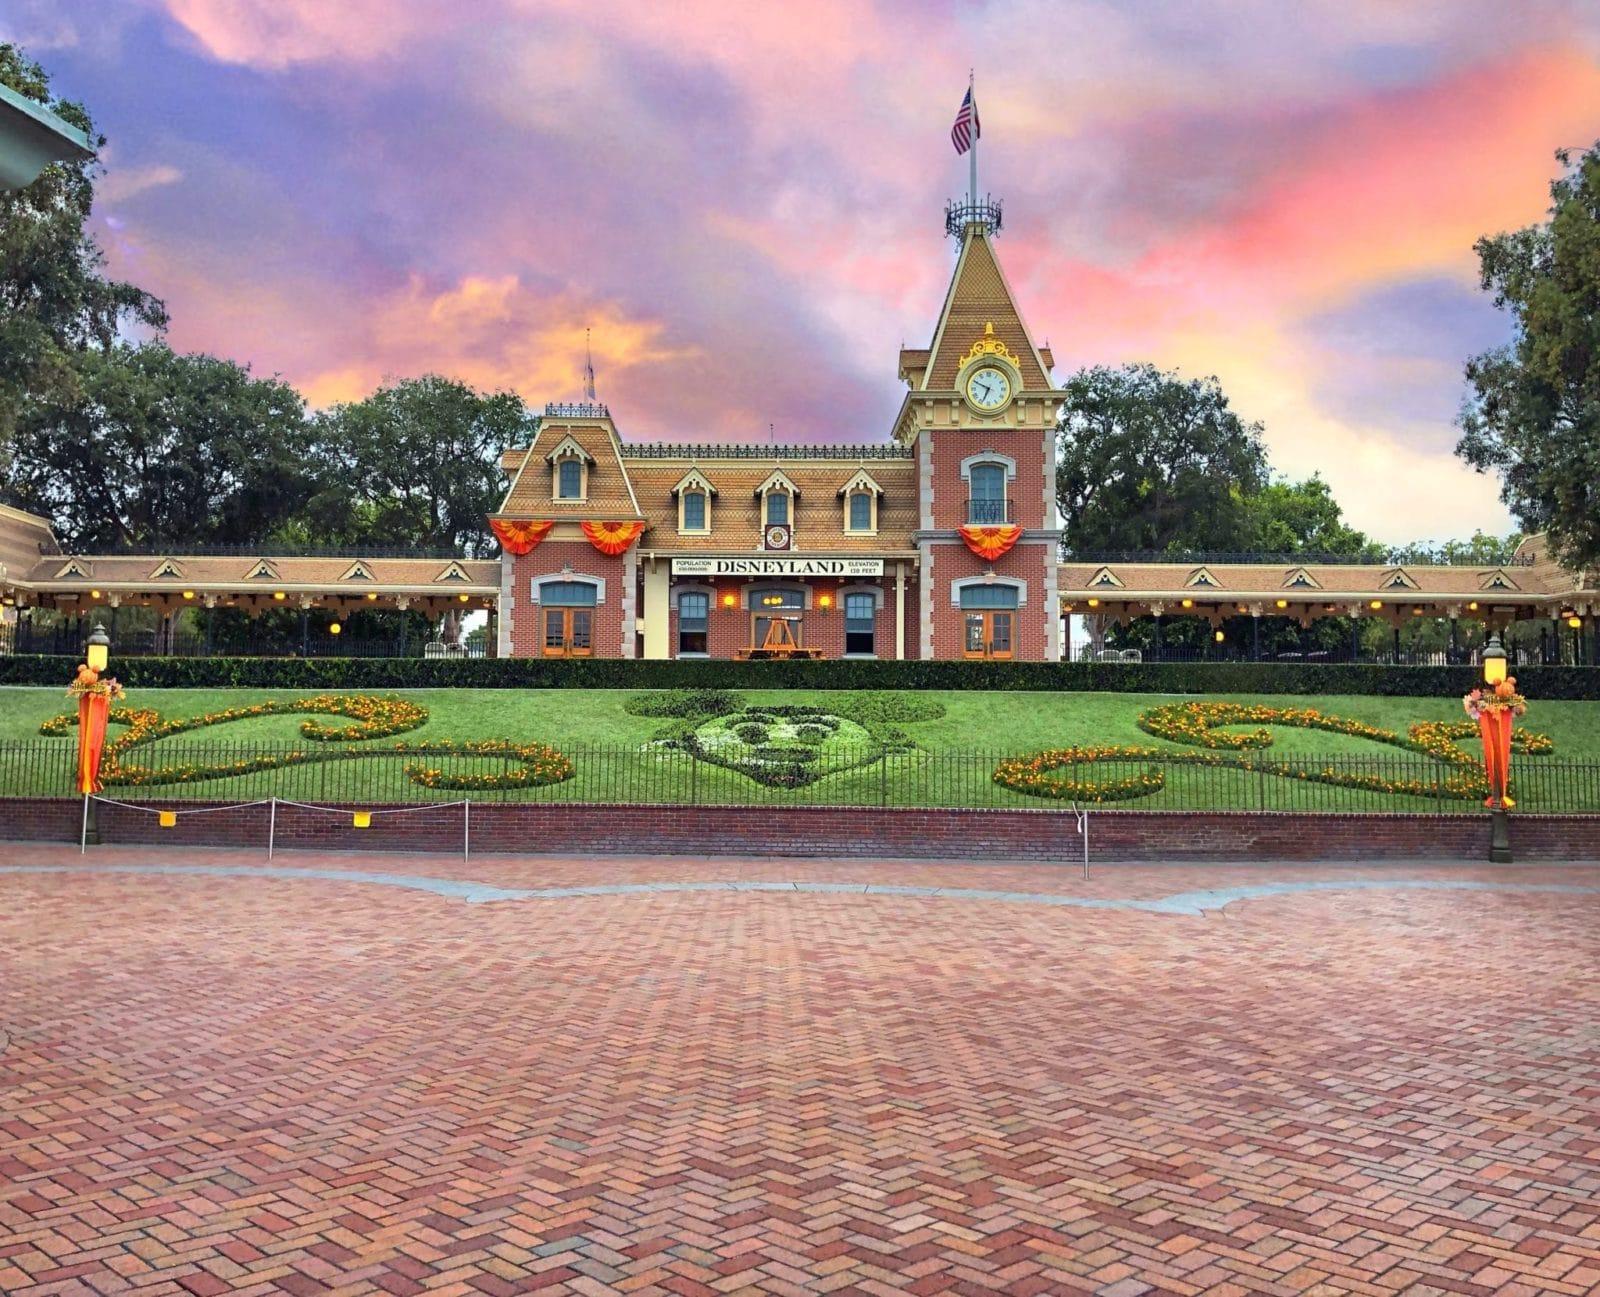 Disneyland main entrance at sunset